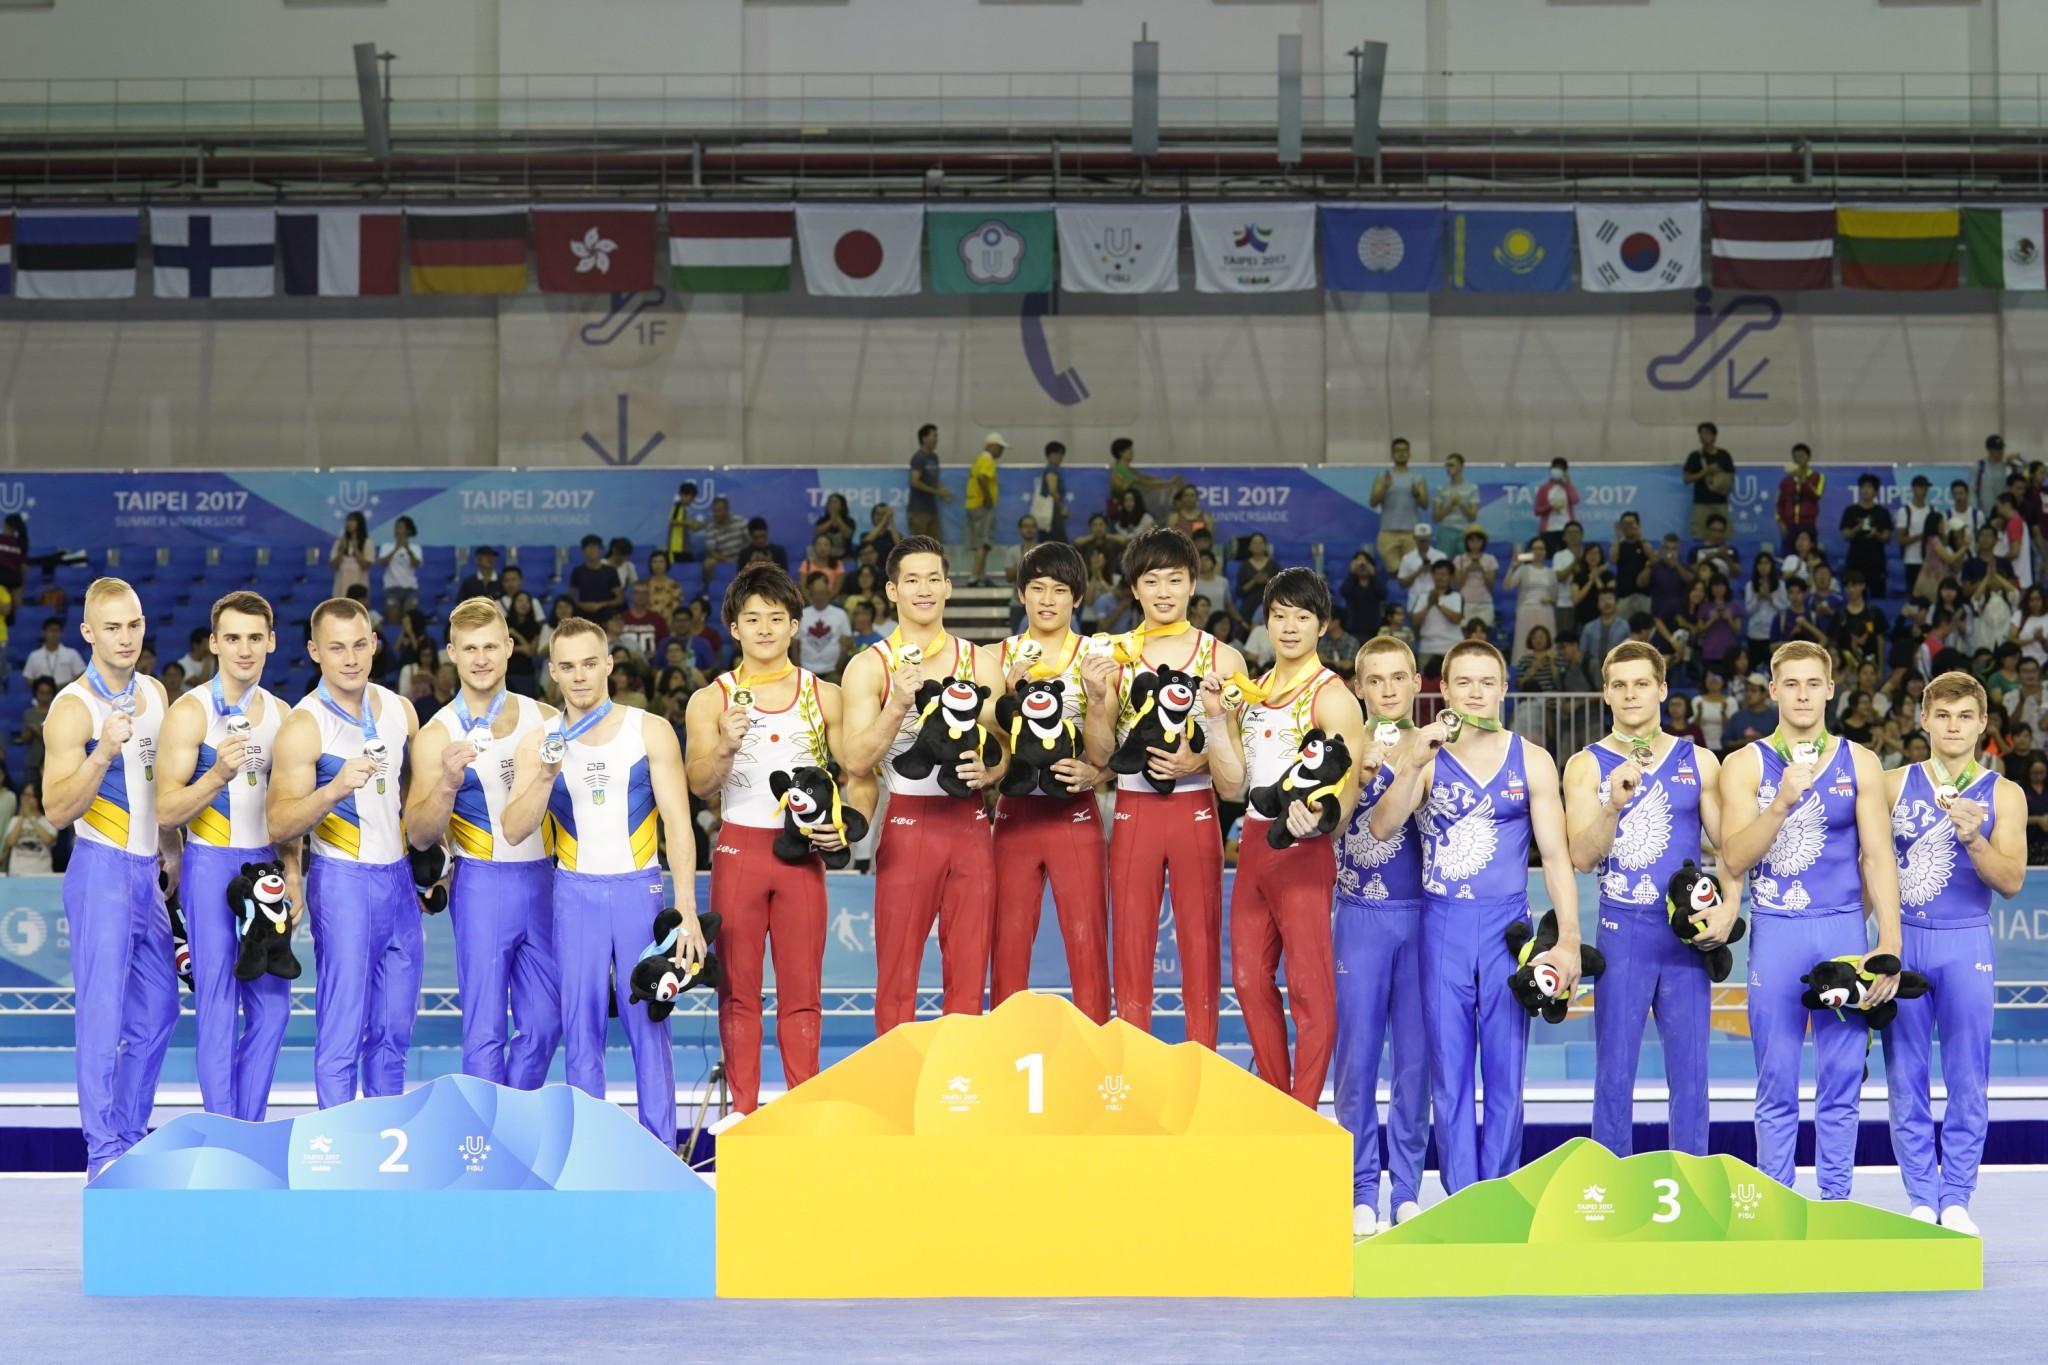 Japan beat the Ukraine to men's team gymnastics gold ©Taipei 2017